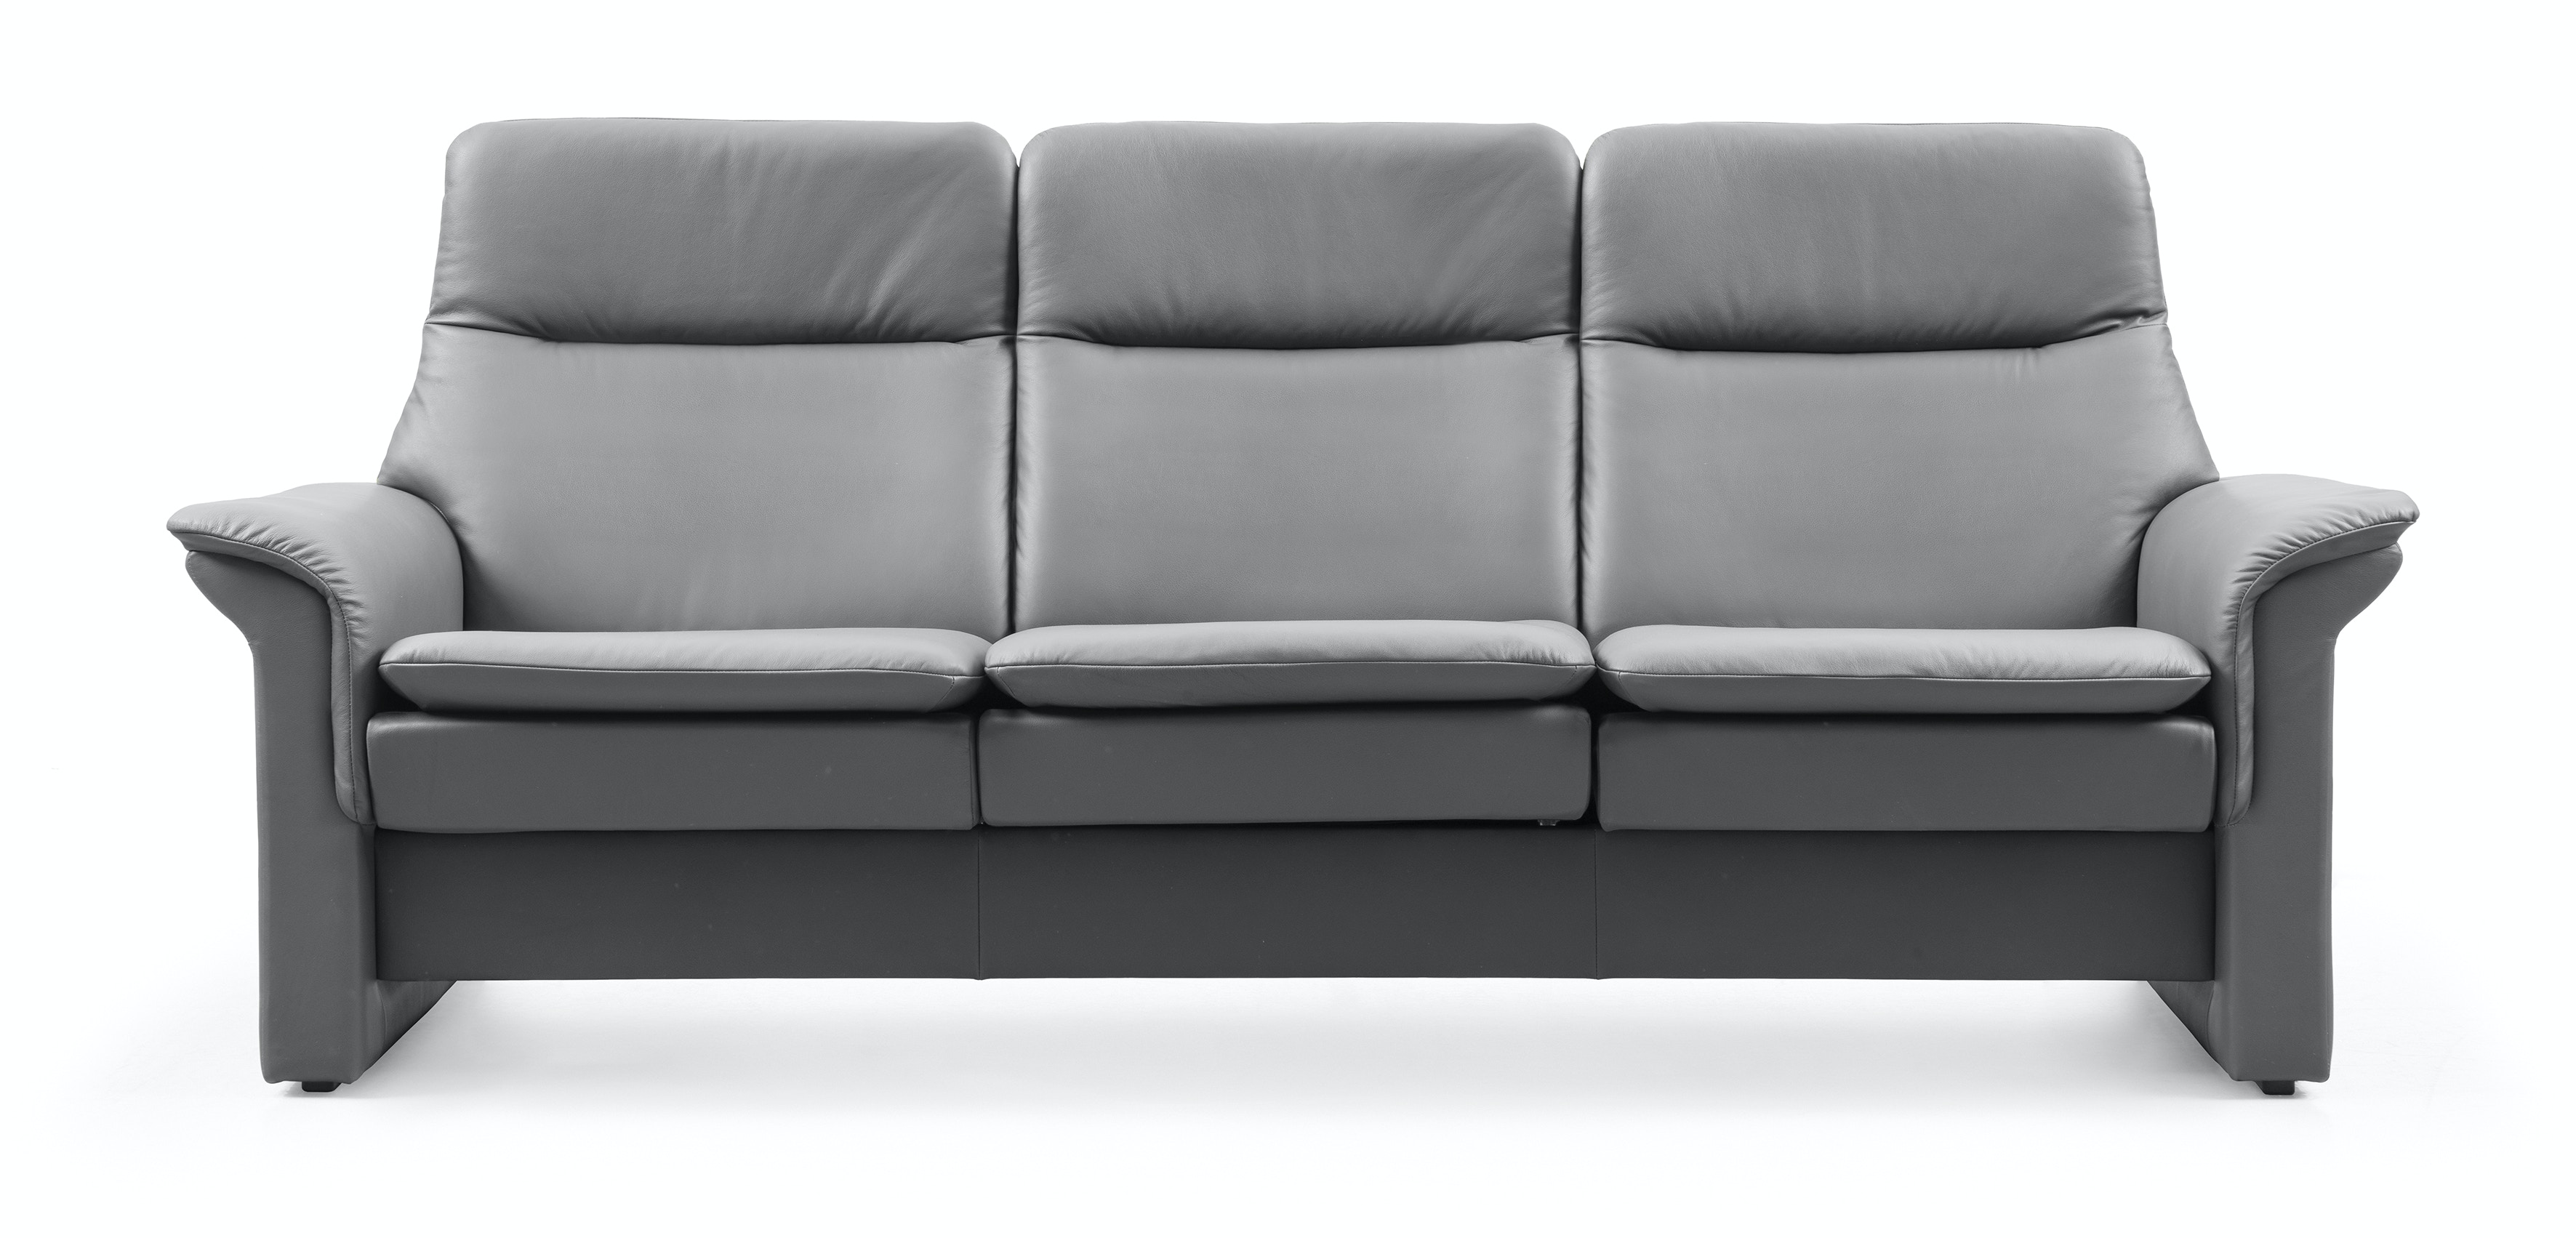 Stressless By Ekornes Living Room Stressless® Saga Sofa High Back